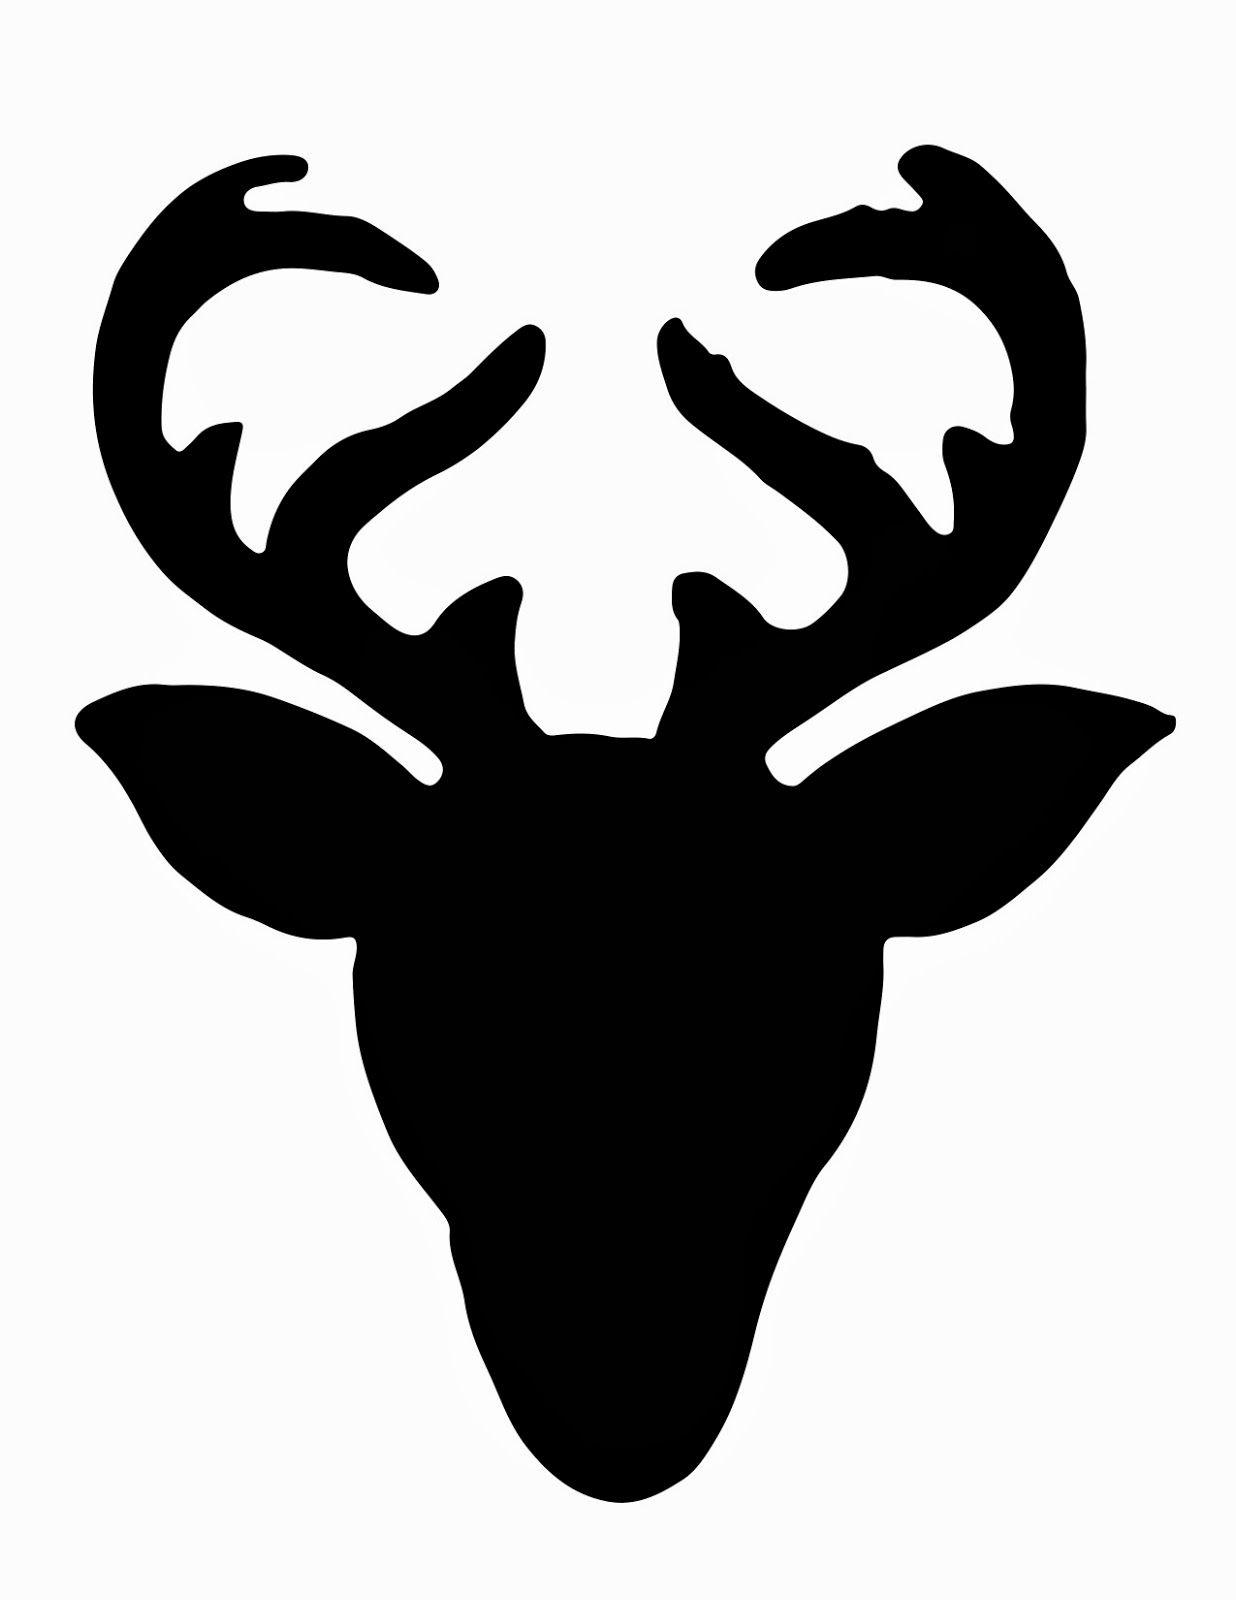 1236x1600 No Sew Deer Head Silhouette Sweater Deer Head Silhouette